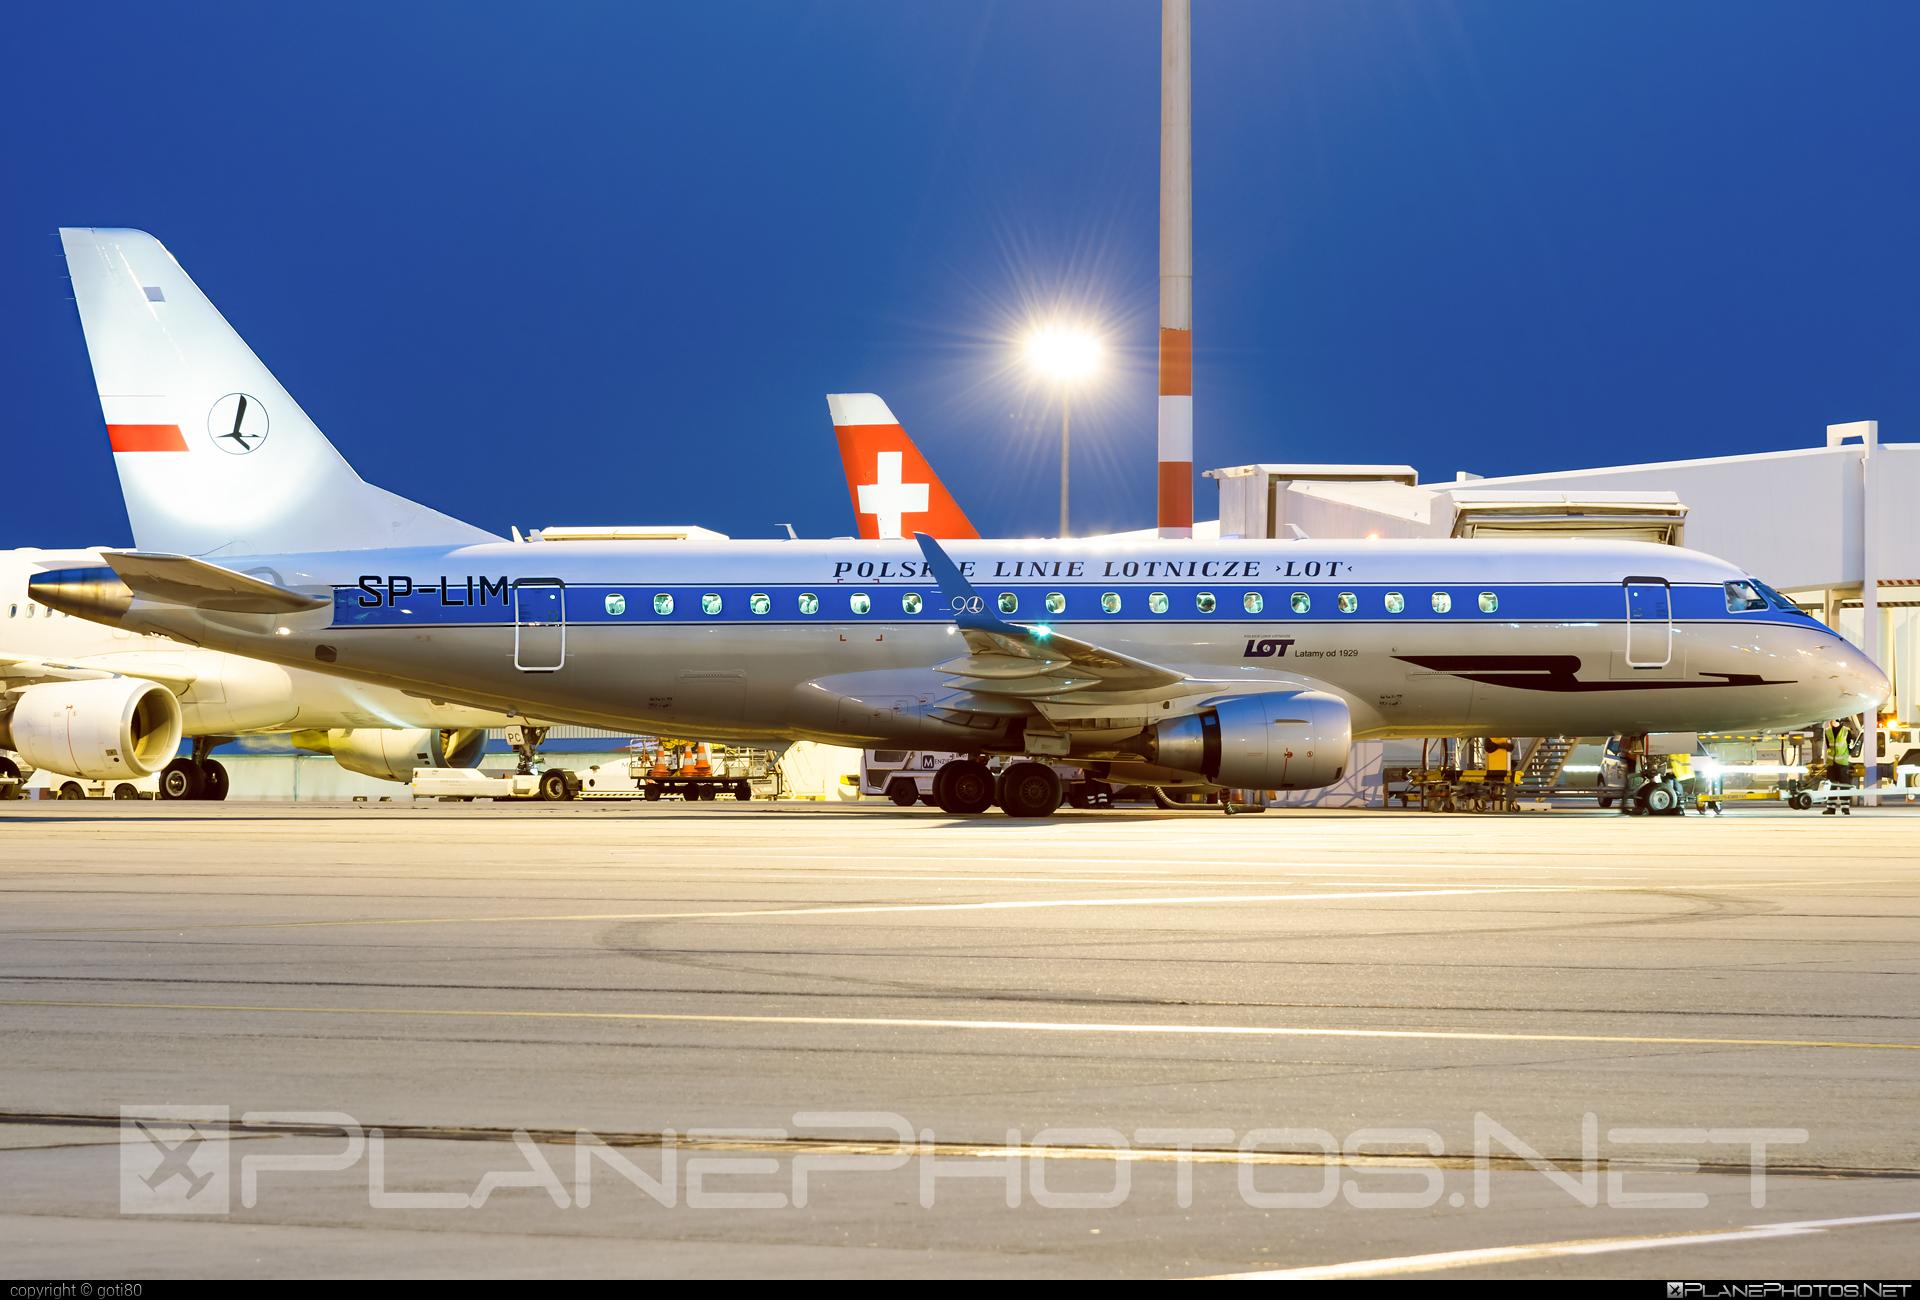 Embraer E175LR (ERJ-170-200LR) - SP-LIM operated by LOT Polish Airlines #e175 #embraer #embraer175 #embraer175lr #erj170200 #erj170200lr #erj175 #erj175lr #lot #lotpolishairlines